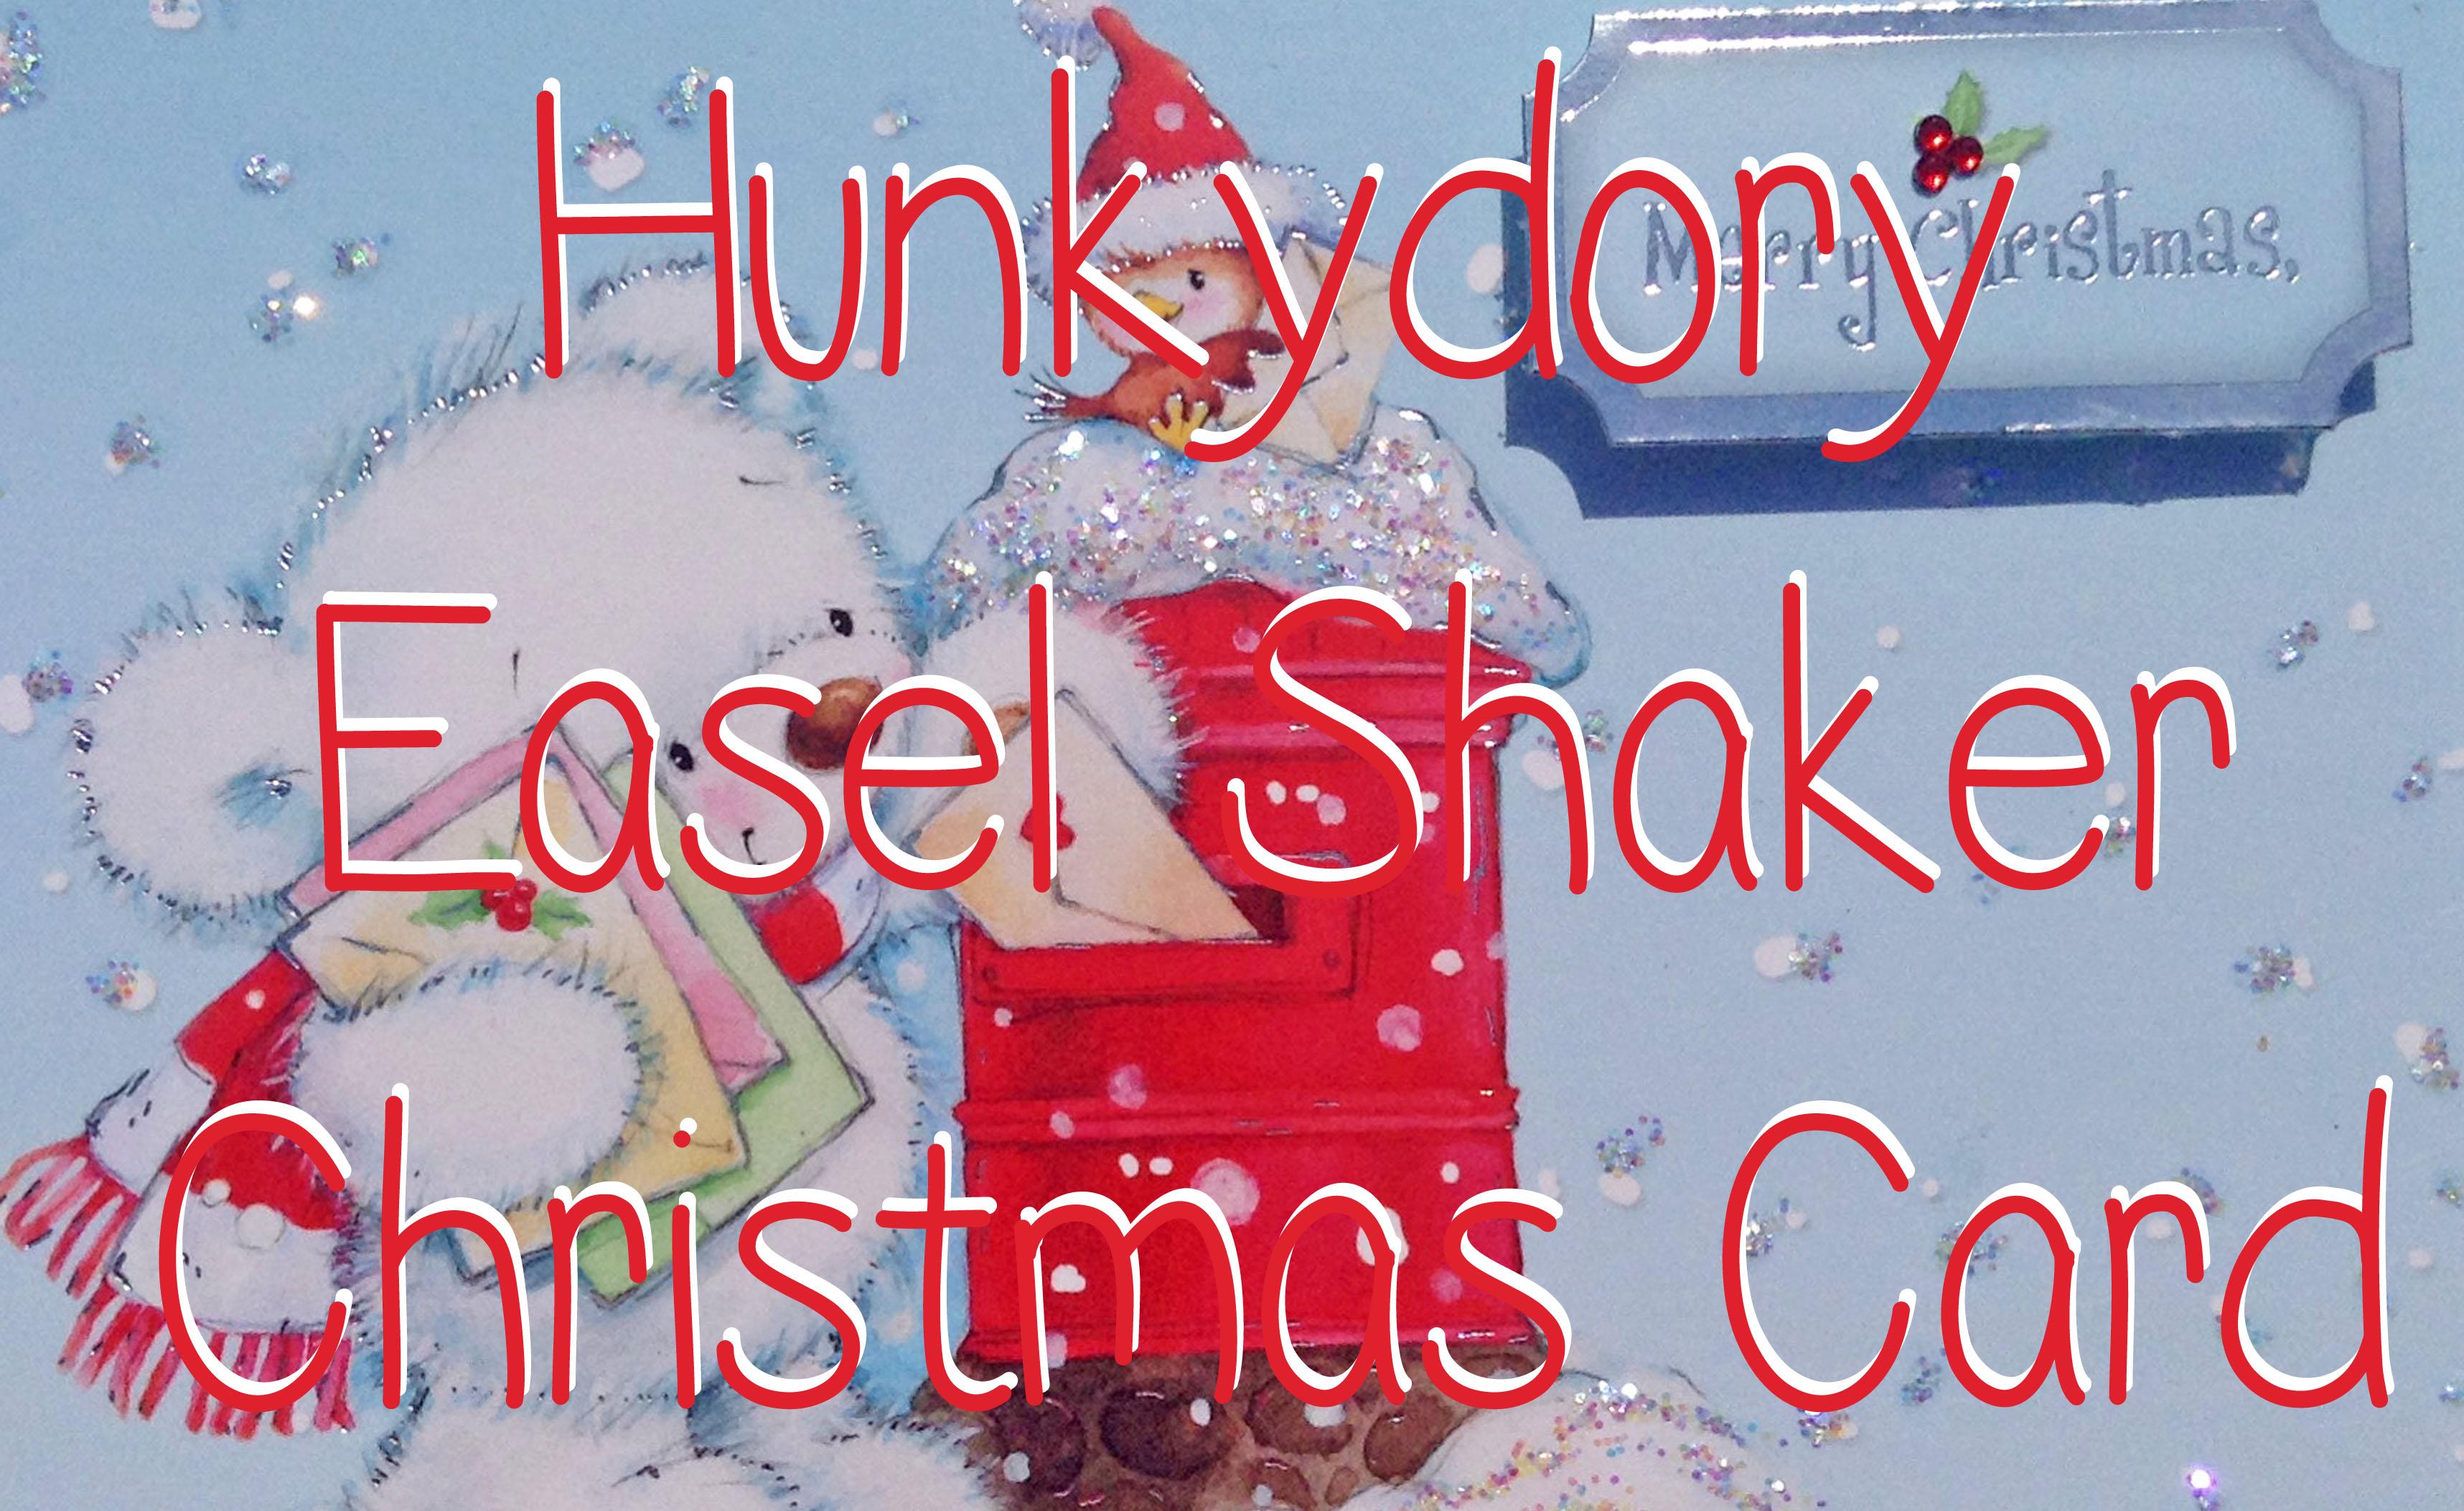 Hunkydory snowbear easel shaker